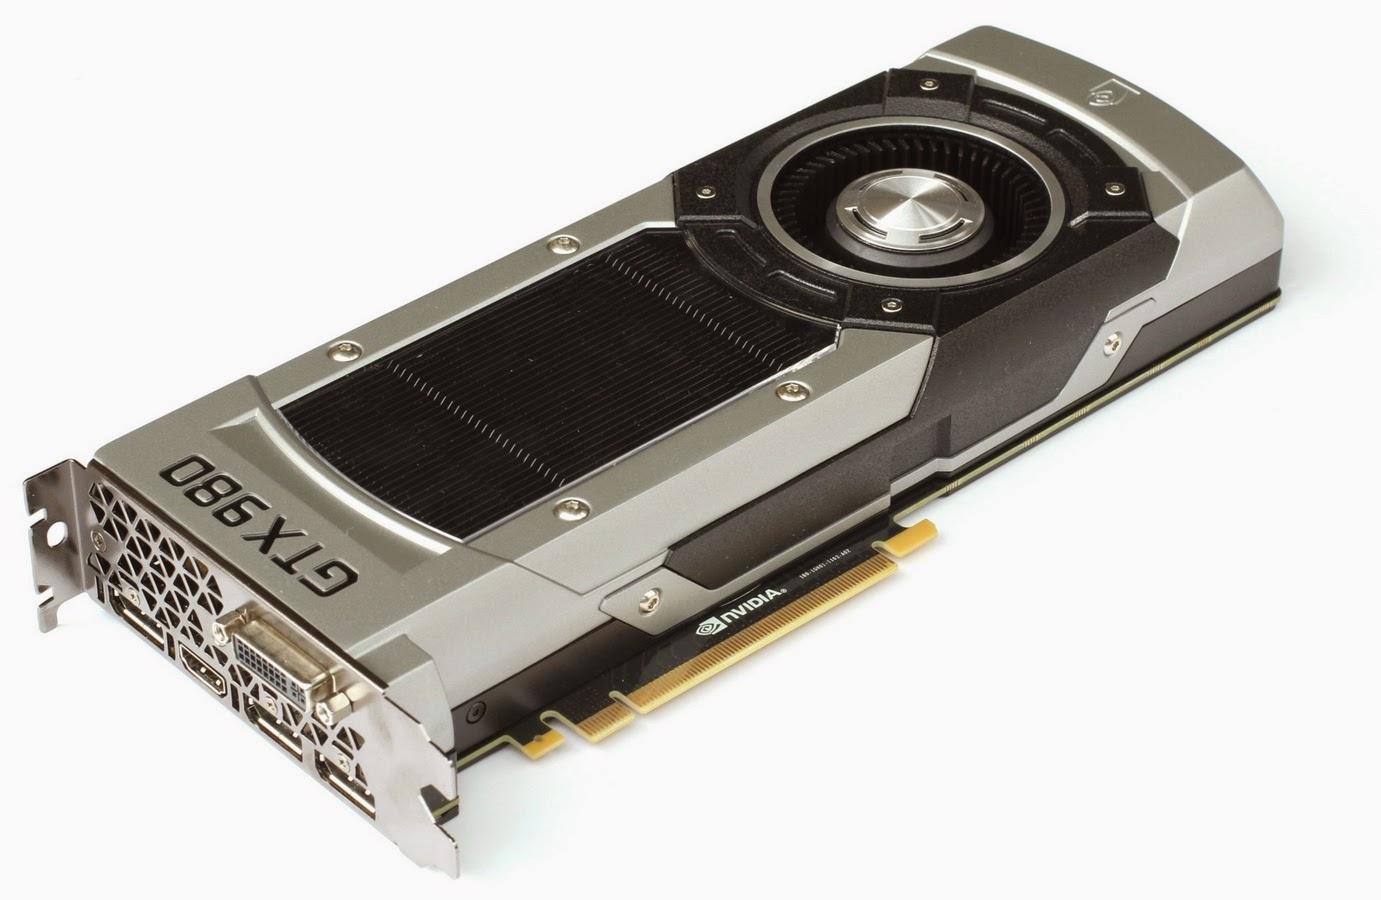 la-centrale-du-hardware-test-maxwell-gm204-nvidia-geforce-gtx-970-980-msi-gigabyte-asus-zotac-gainward-evga-pny